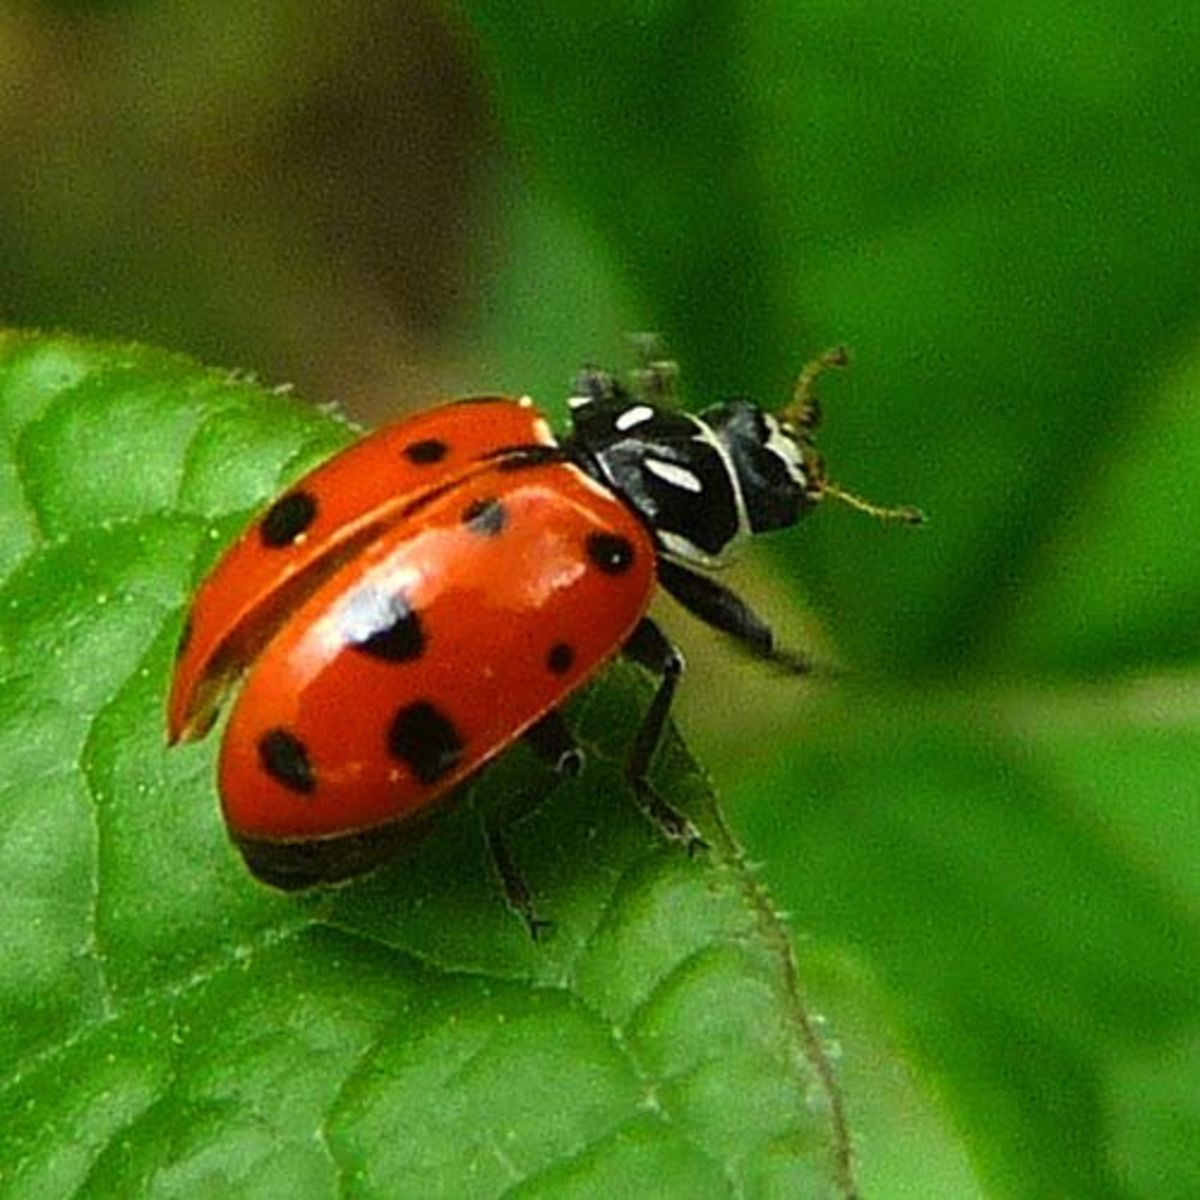 Ladybugs (Coccinellidae)